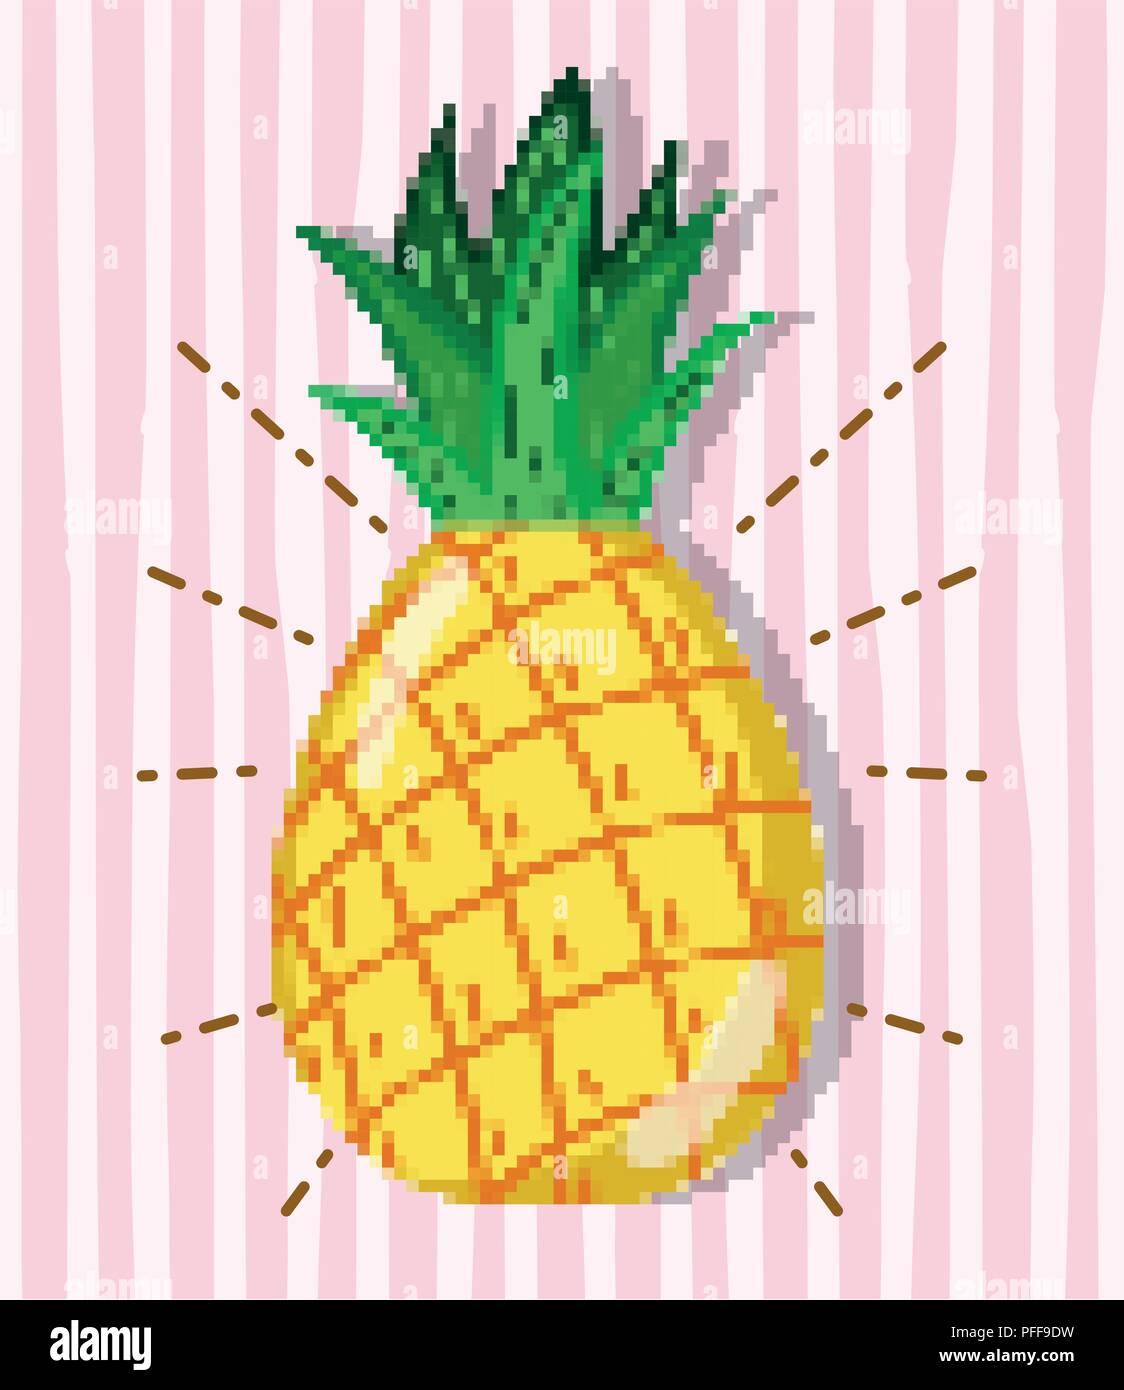 Farm Pixel Cartoons Stock Vector Art Illustration Vector